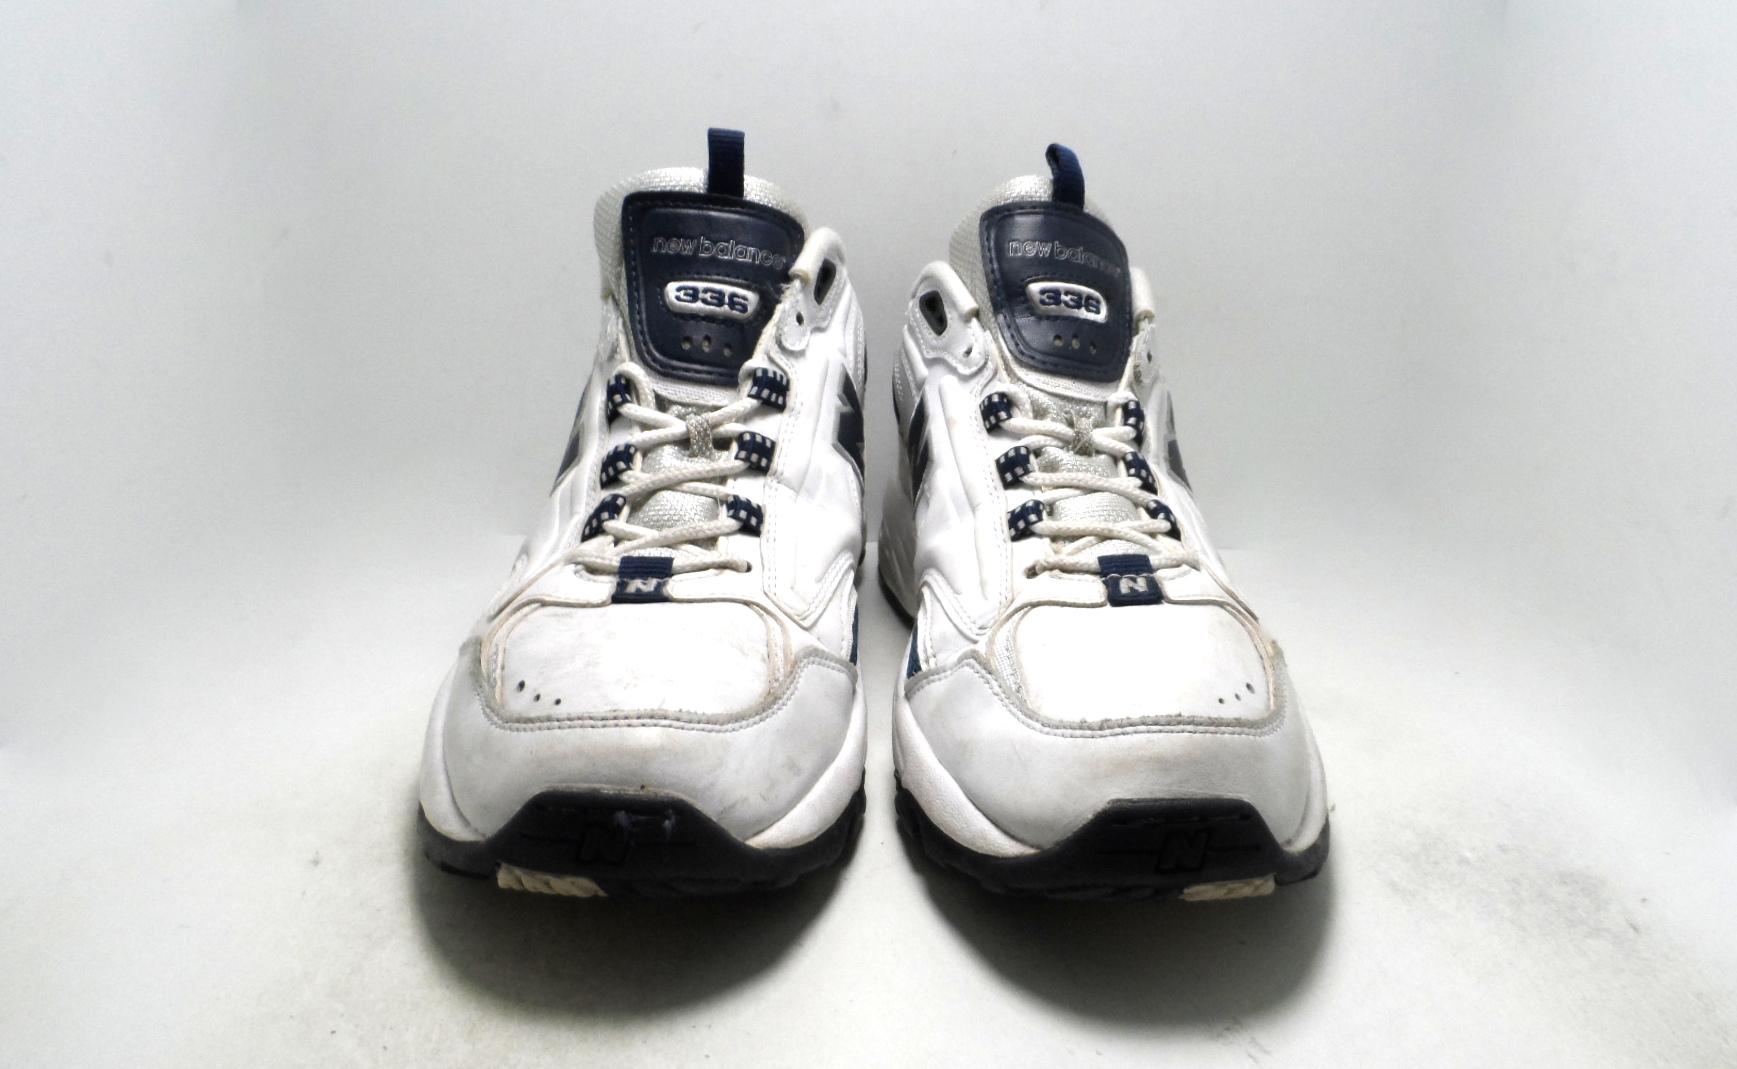 new balance v45 new balance cross training shoes